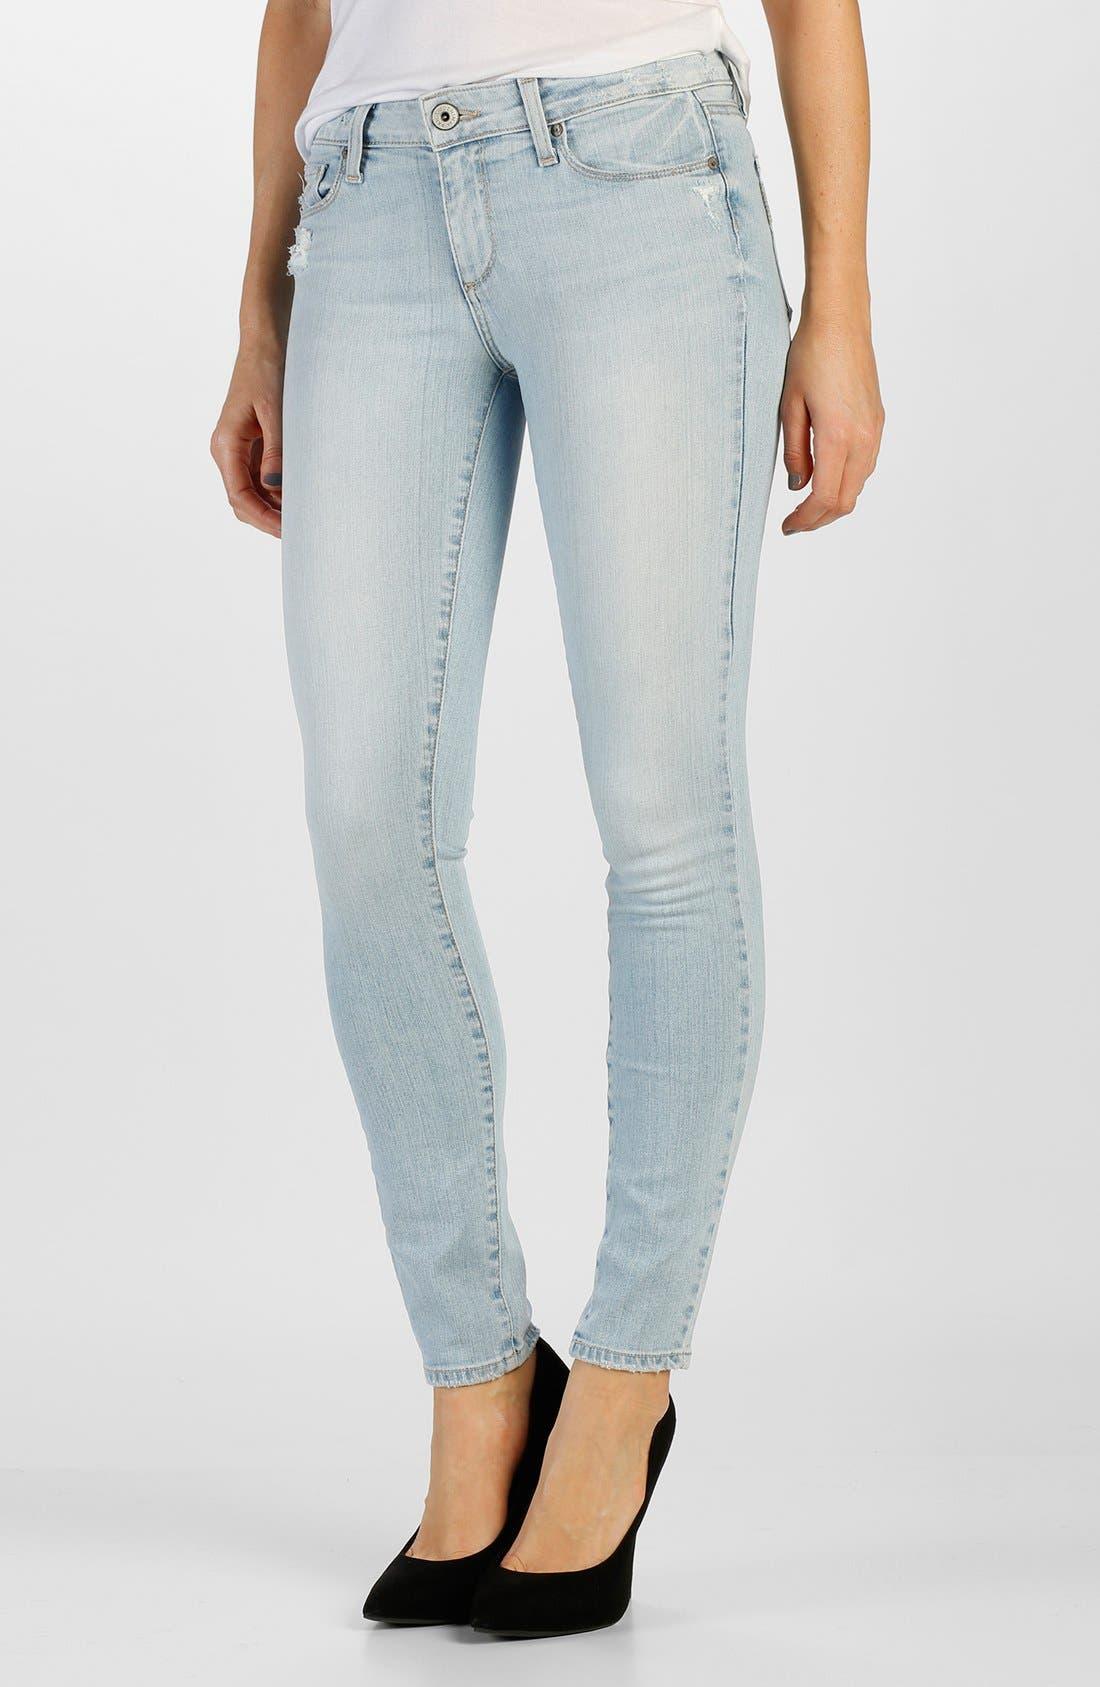 Alternate Image 1 Selected - Paige Denim 'Verdugo' Ultra Skinny Jeans (Harriet Destructed)